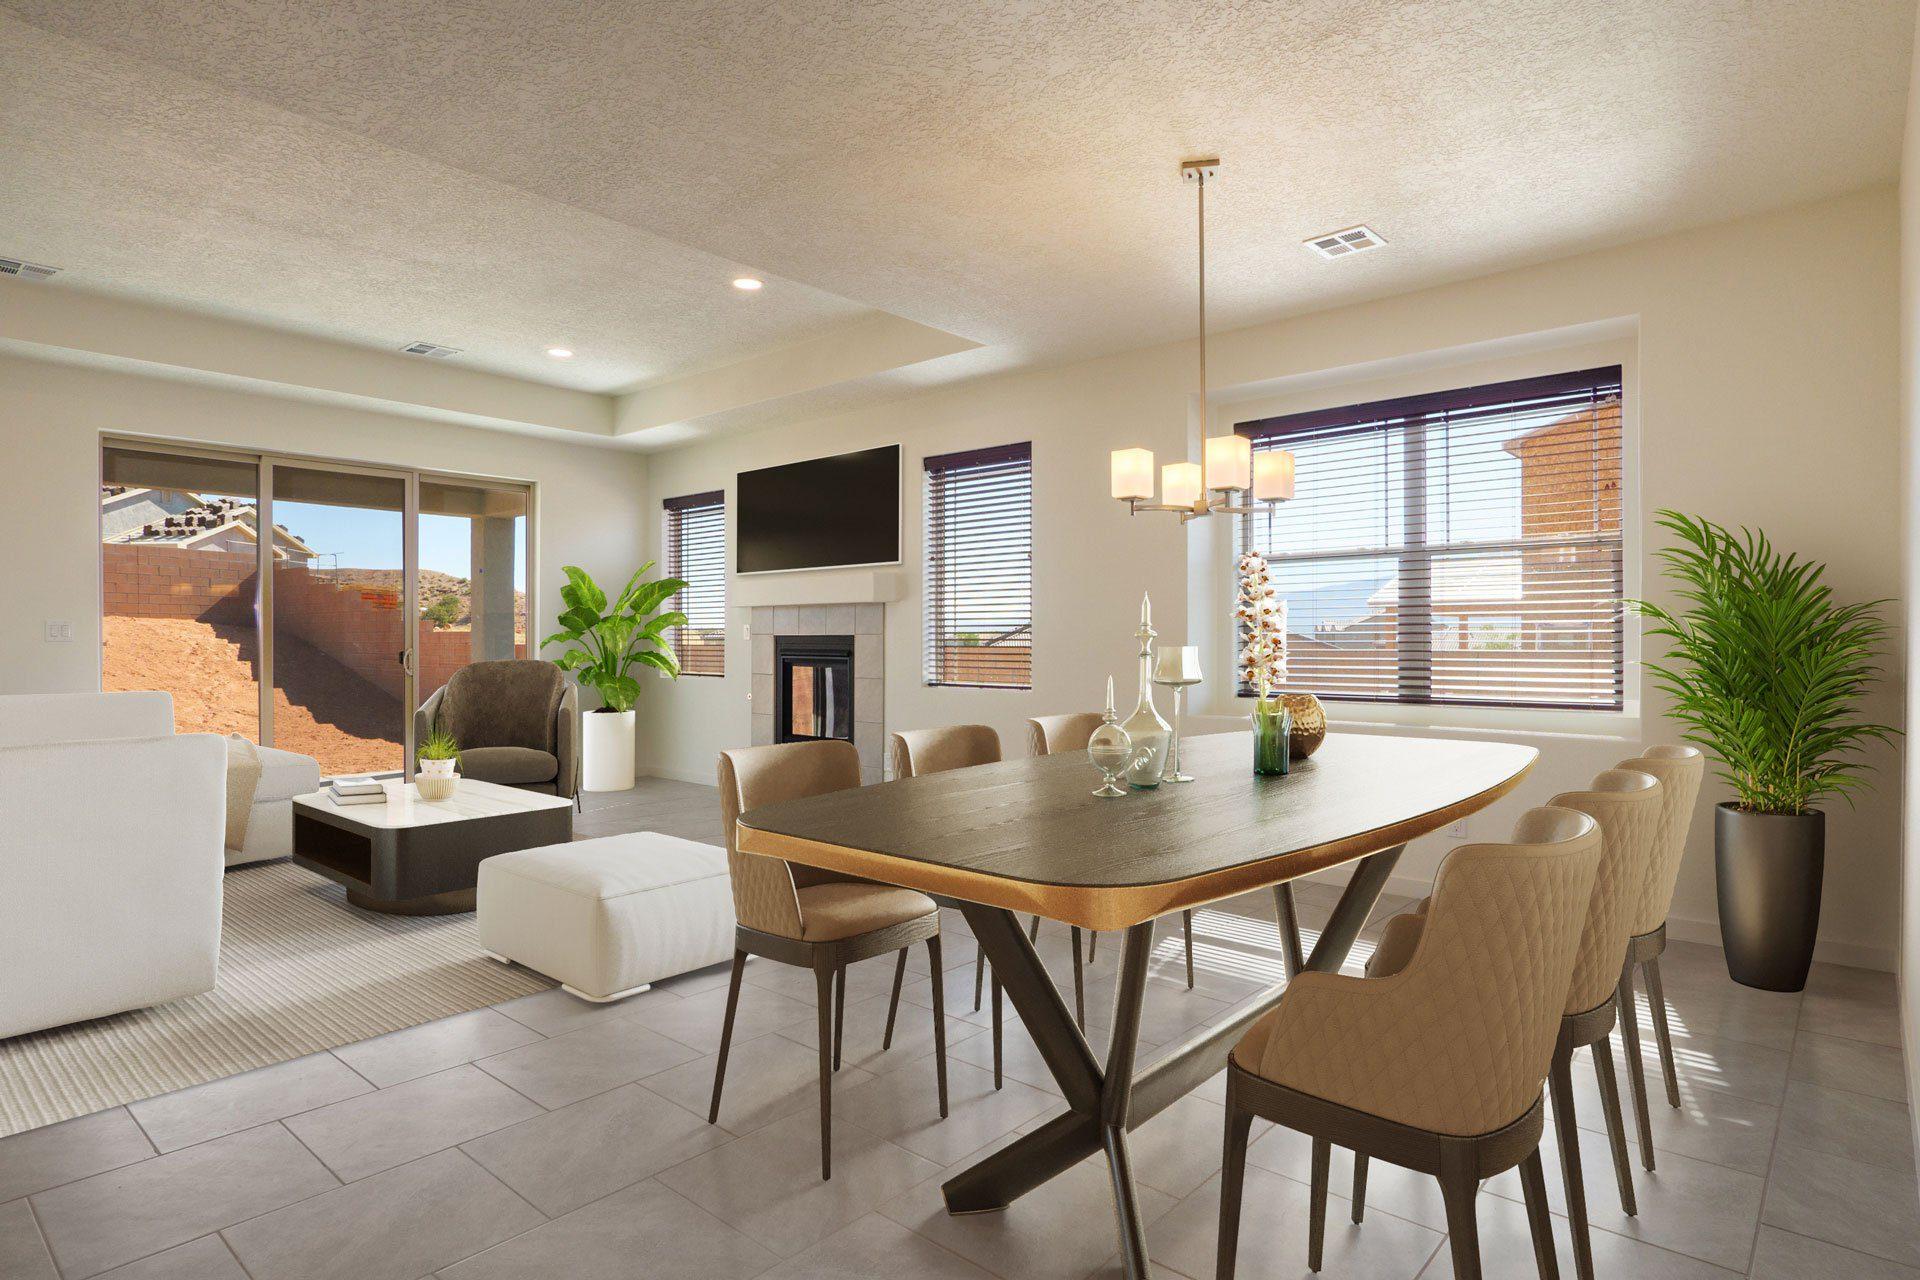 twilight-homes-the-aries-new-homes-rio-rancho